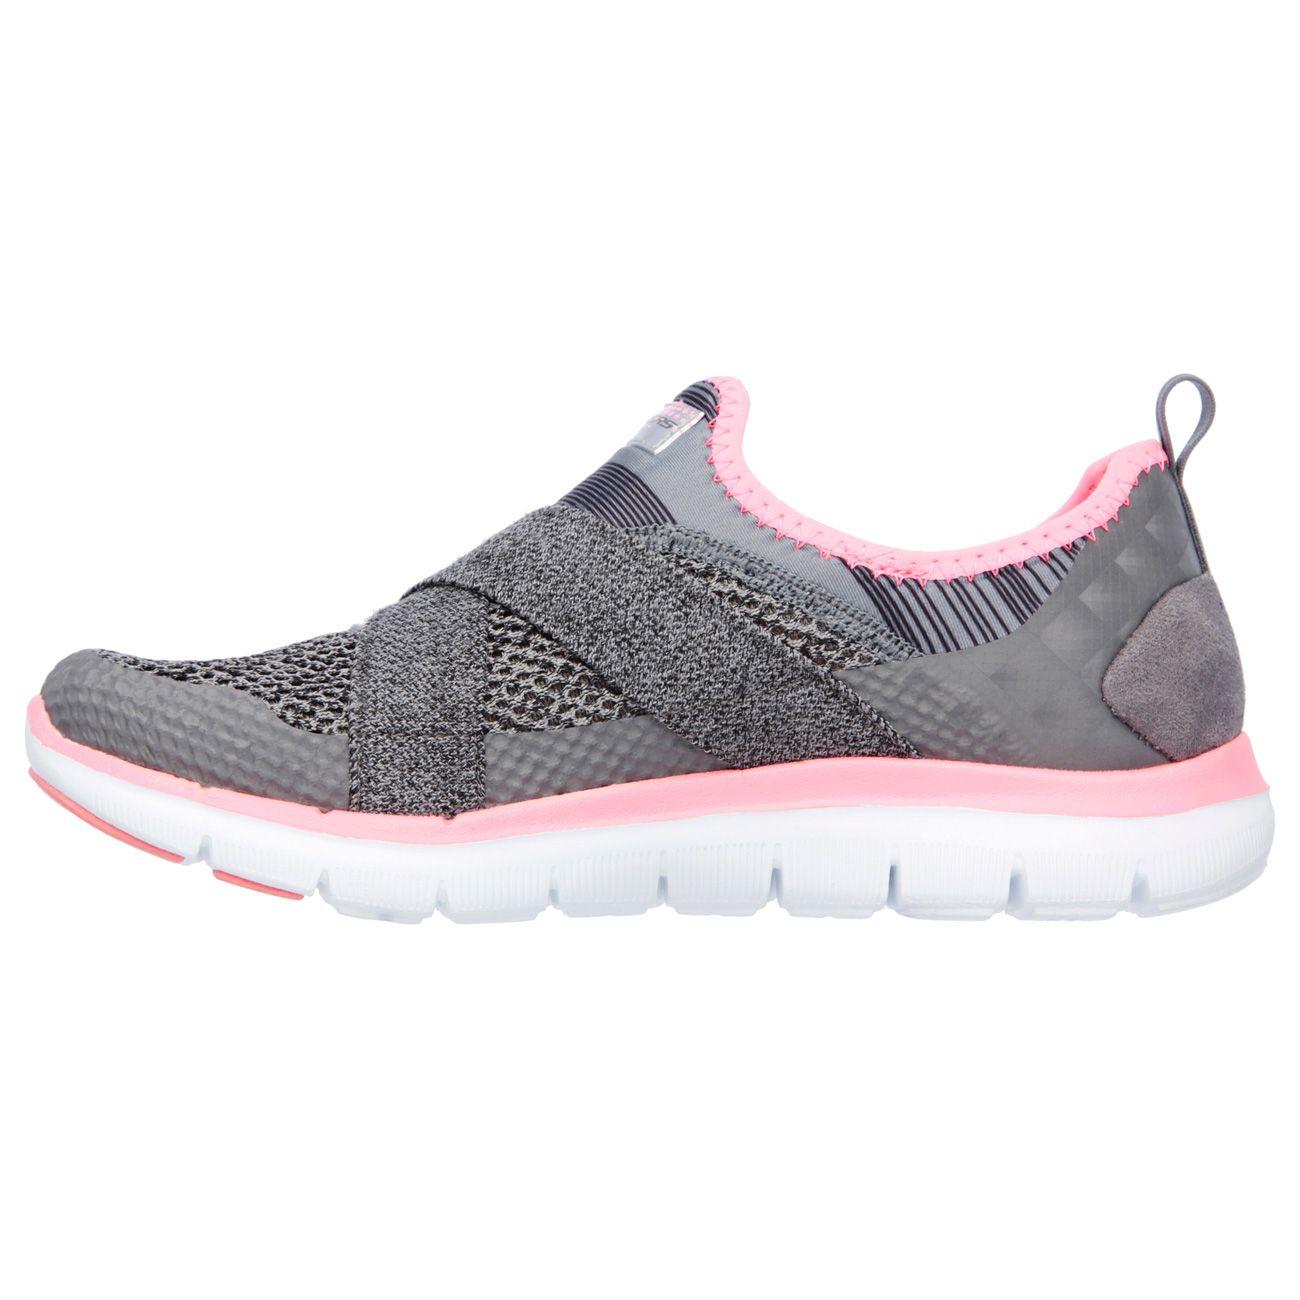 Mens Velcro Closure Athletic Shoes